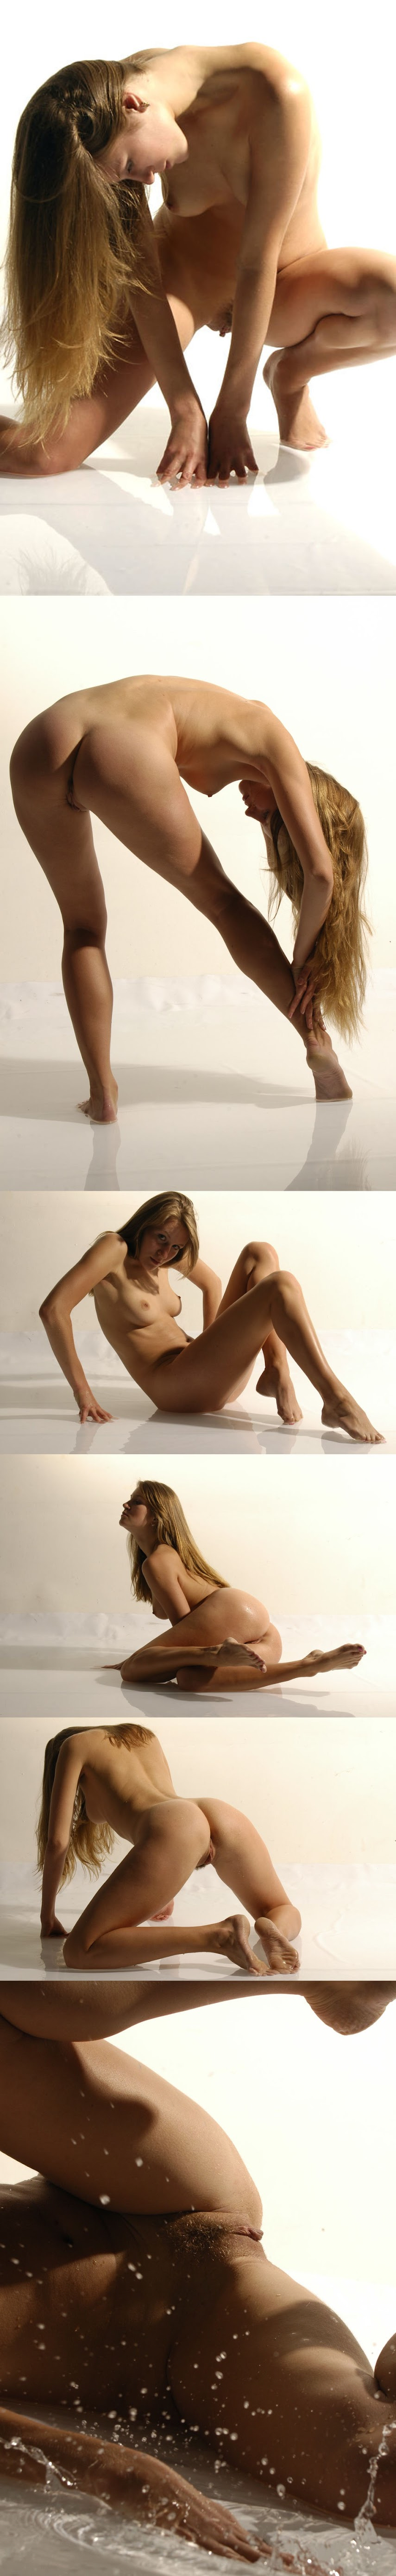 MA_20081207_-_Yana_B_-_Light_-_by_Alexander_Slastyonoff.zip-jk- Met-Art MA 20081208 - Iveta B - Absolutis - by Luca Helios